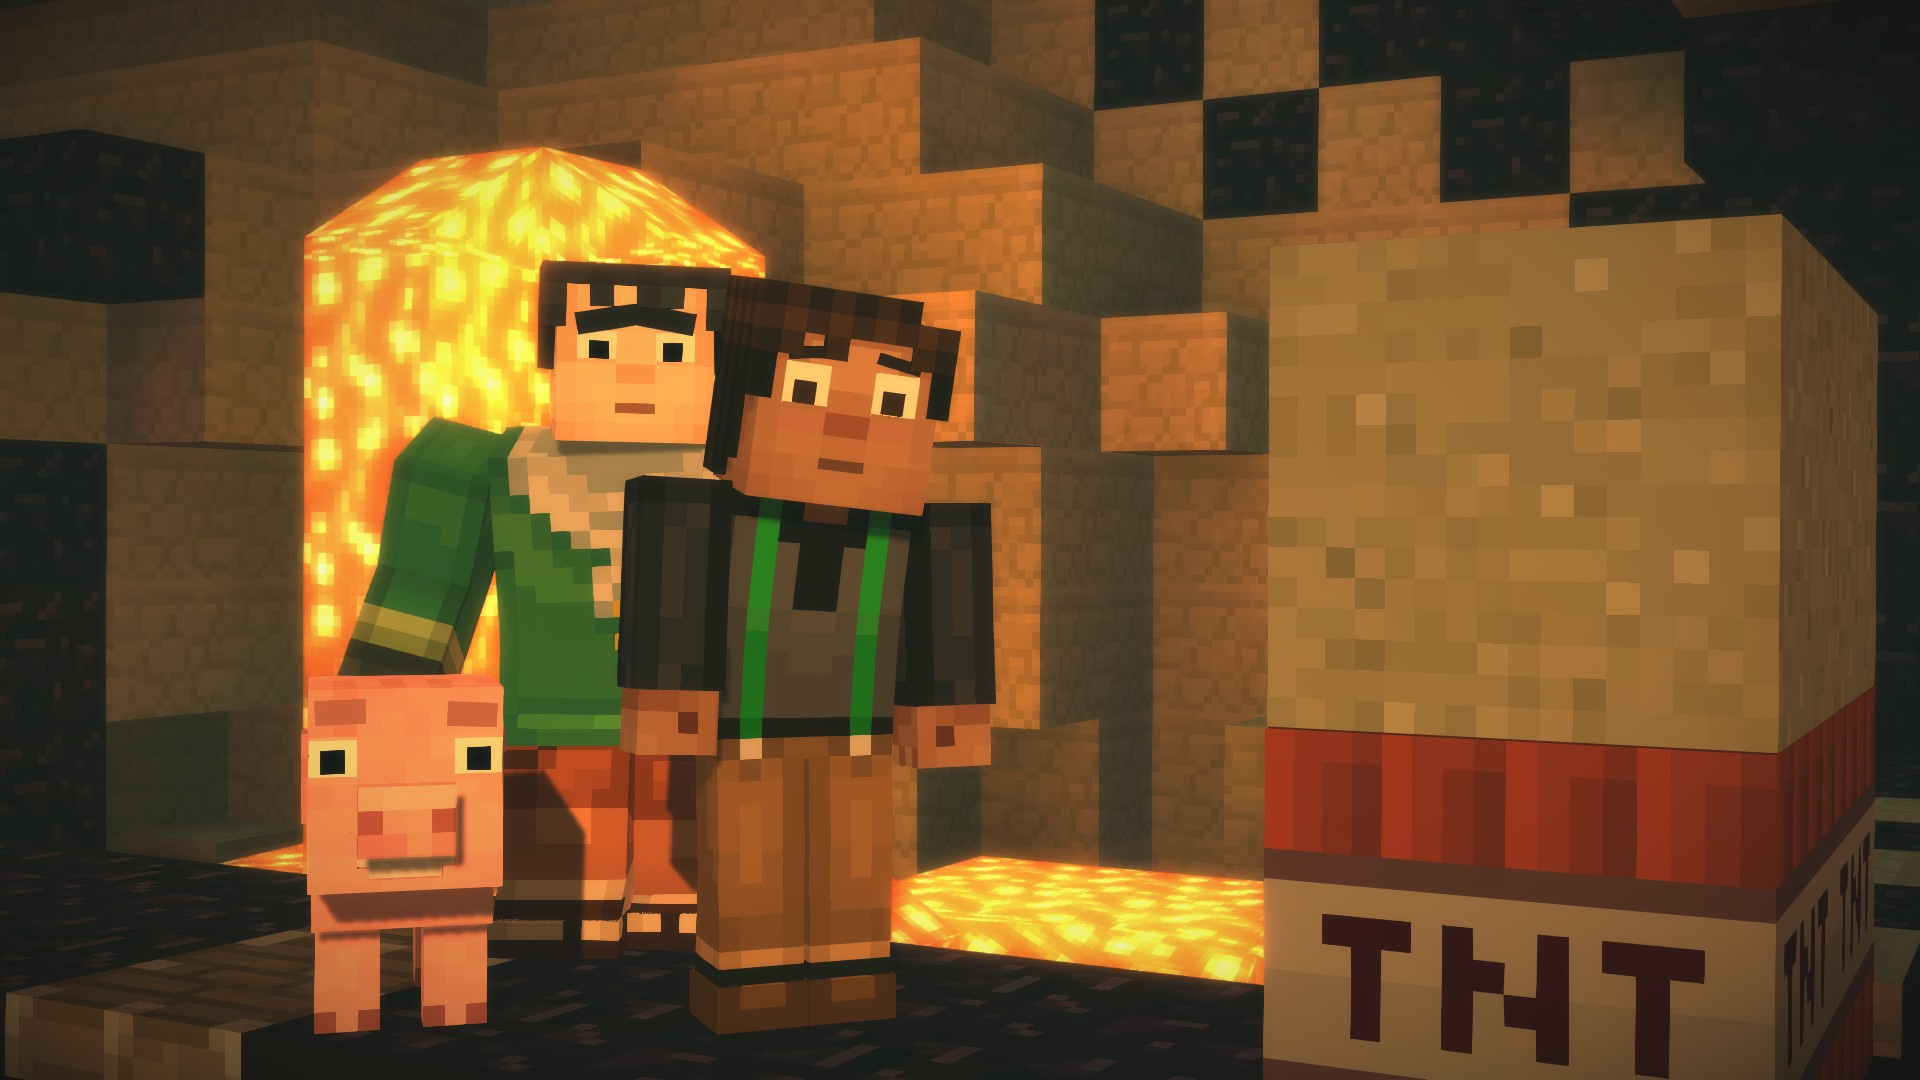 Minecraft Story Mode Episodes 2 5 Wii U EShop News Reviews Trailer Amp Screenshots